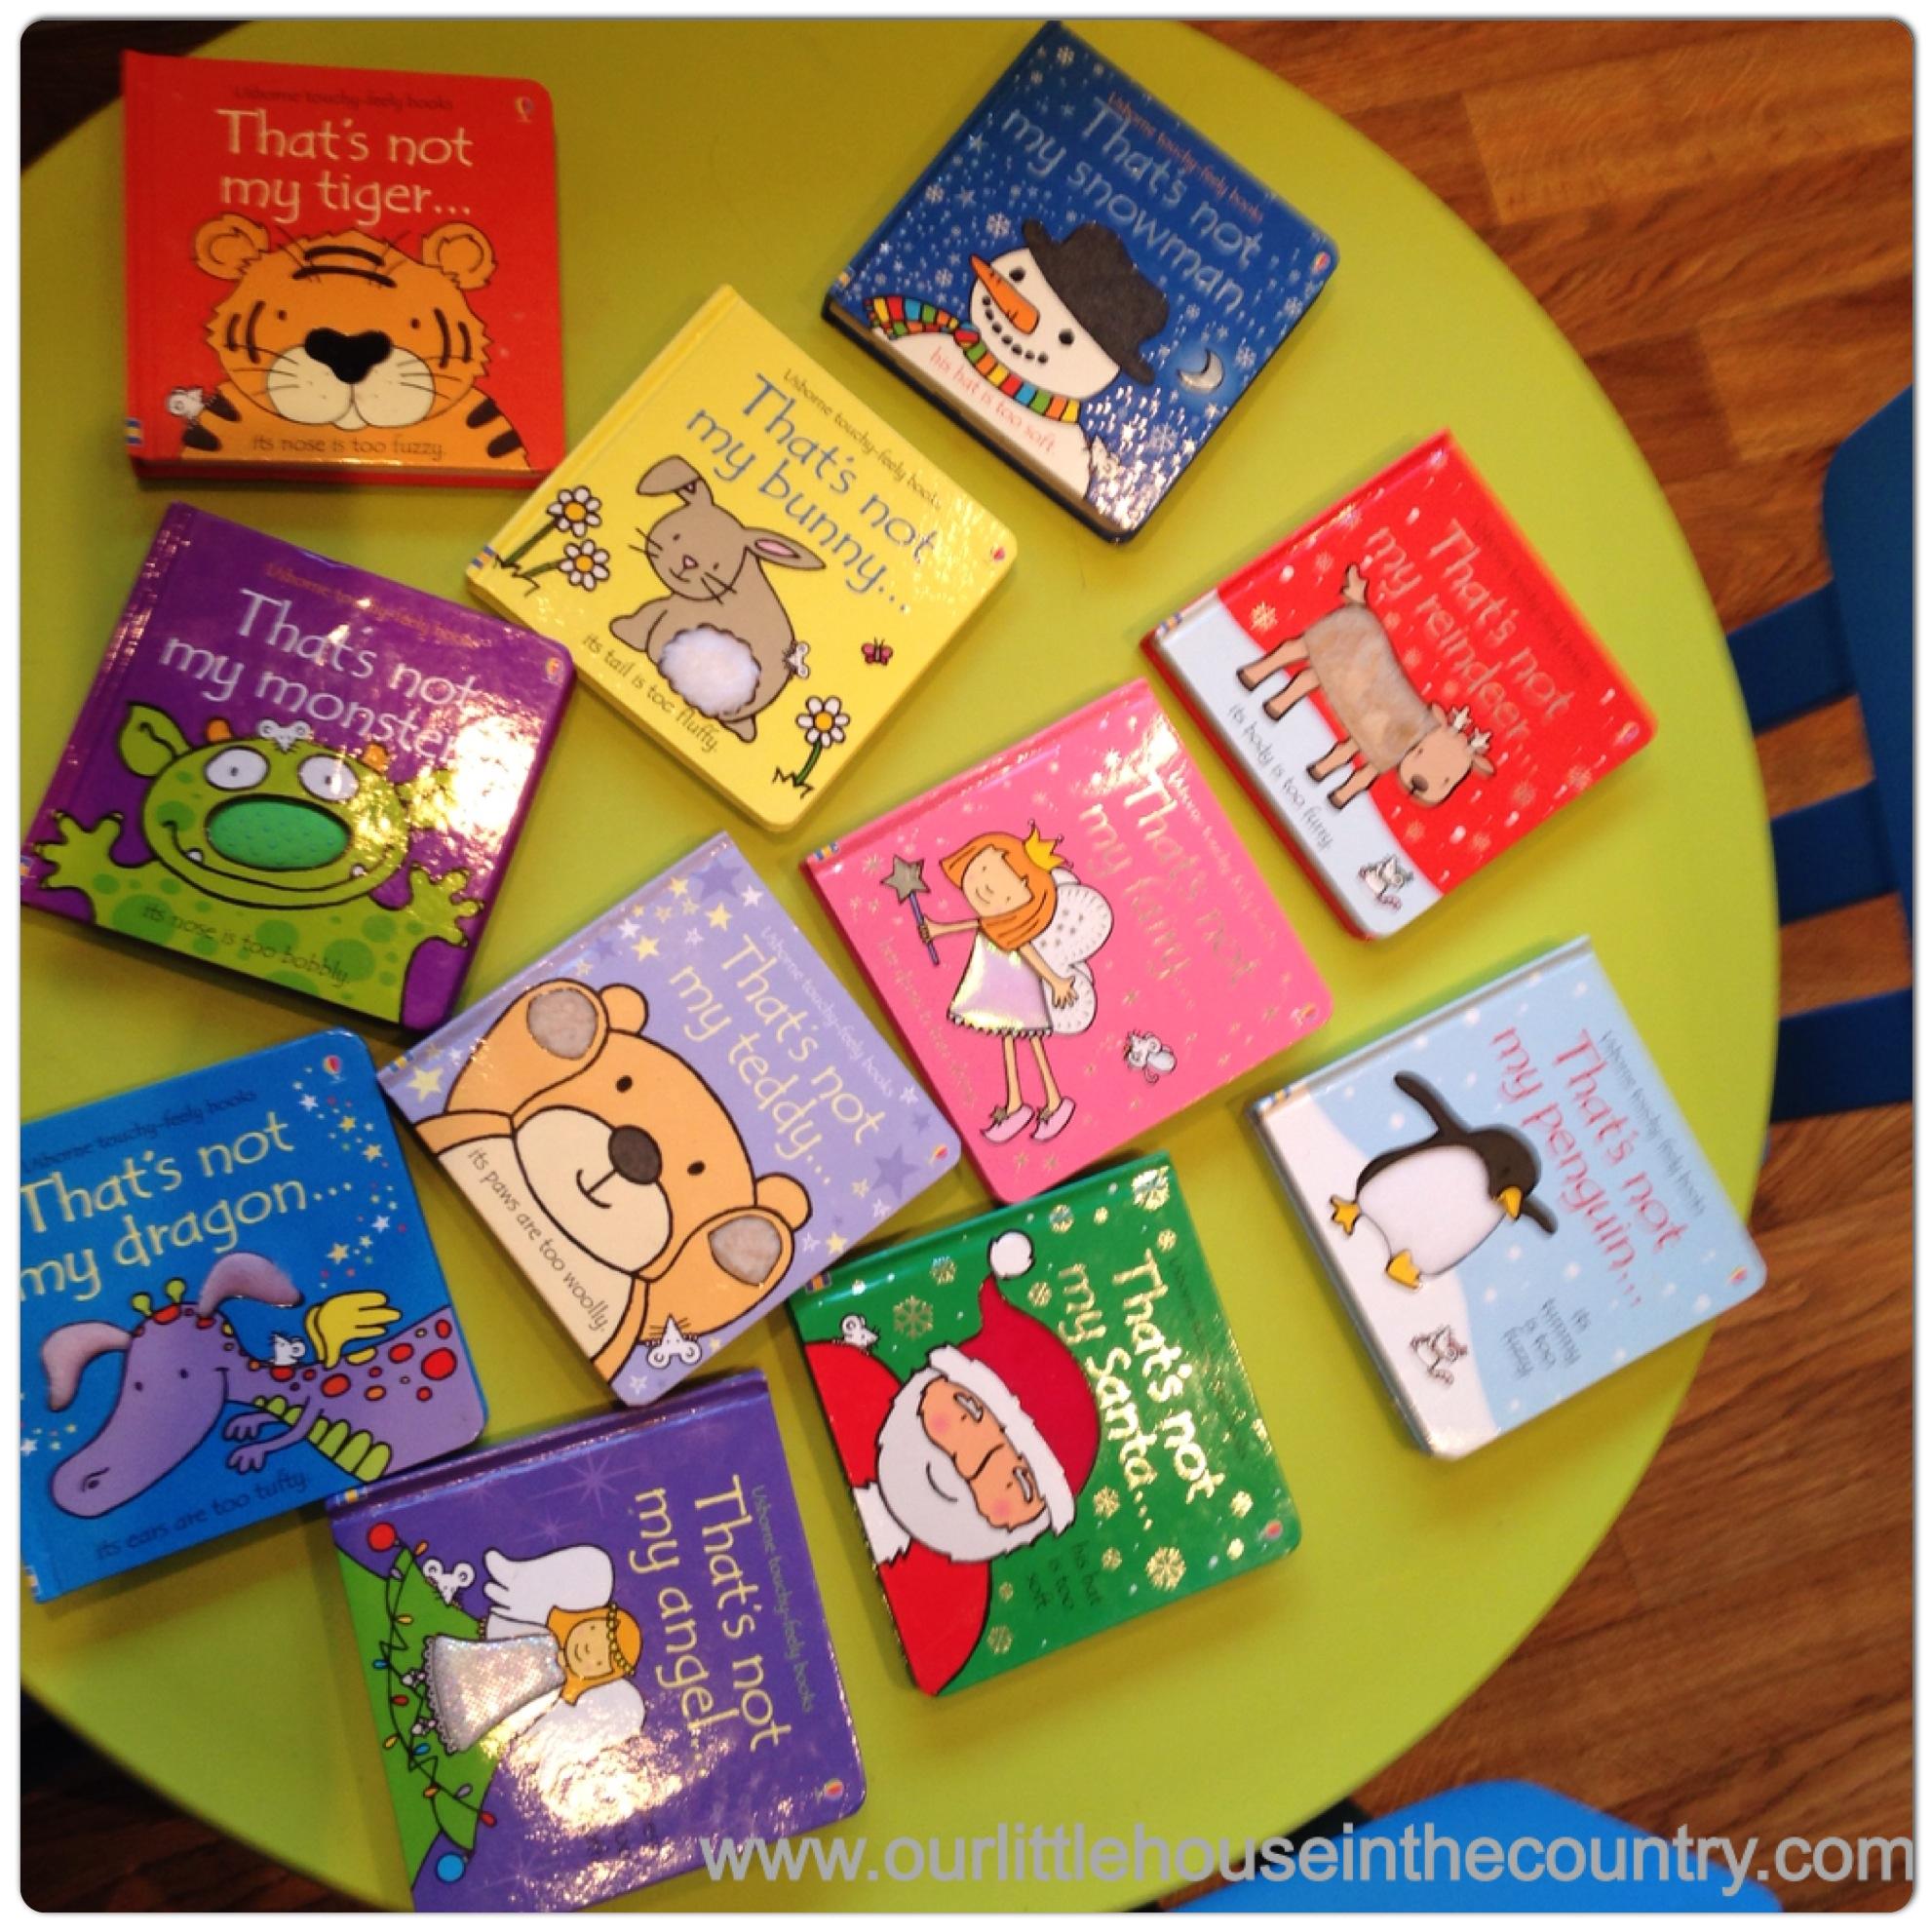 books with descriptive language